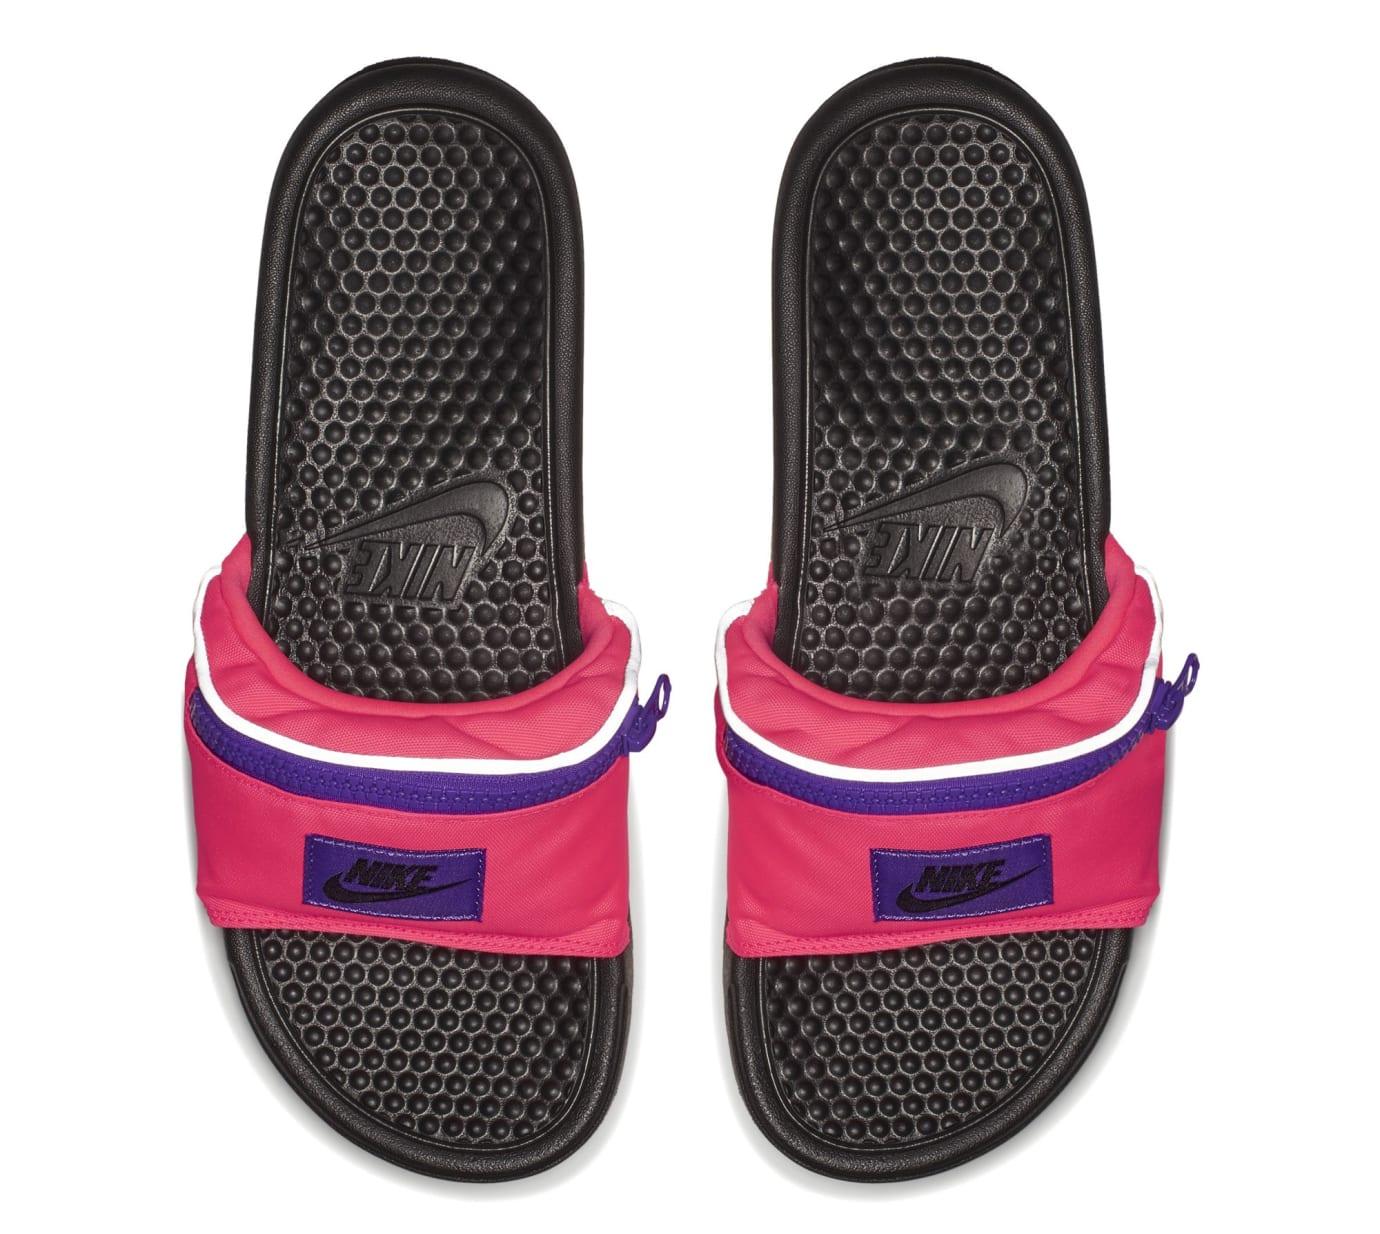 Nike Benassi JDI 'Fanny Pack' Black/Pink (Top)